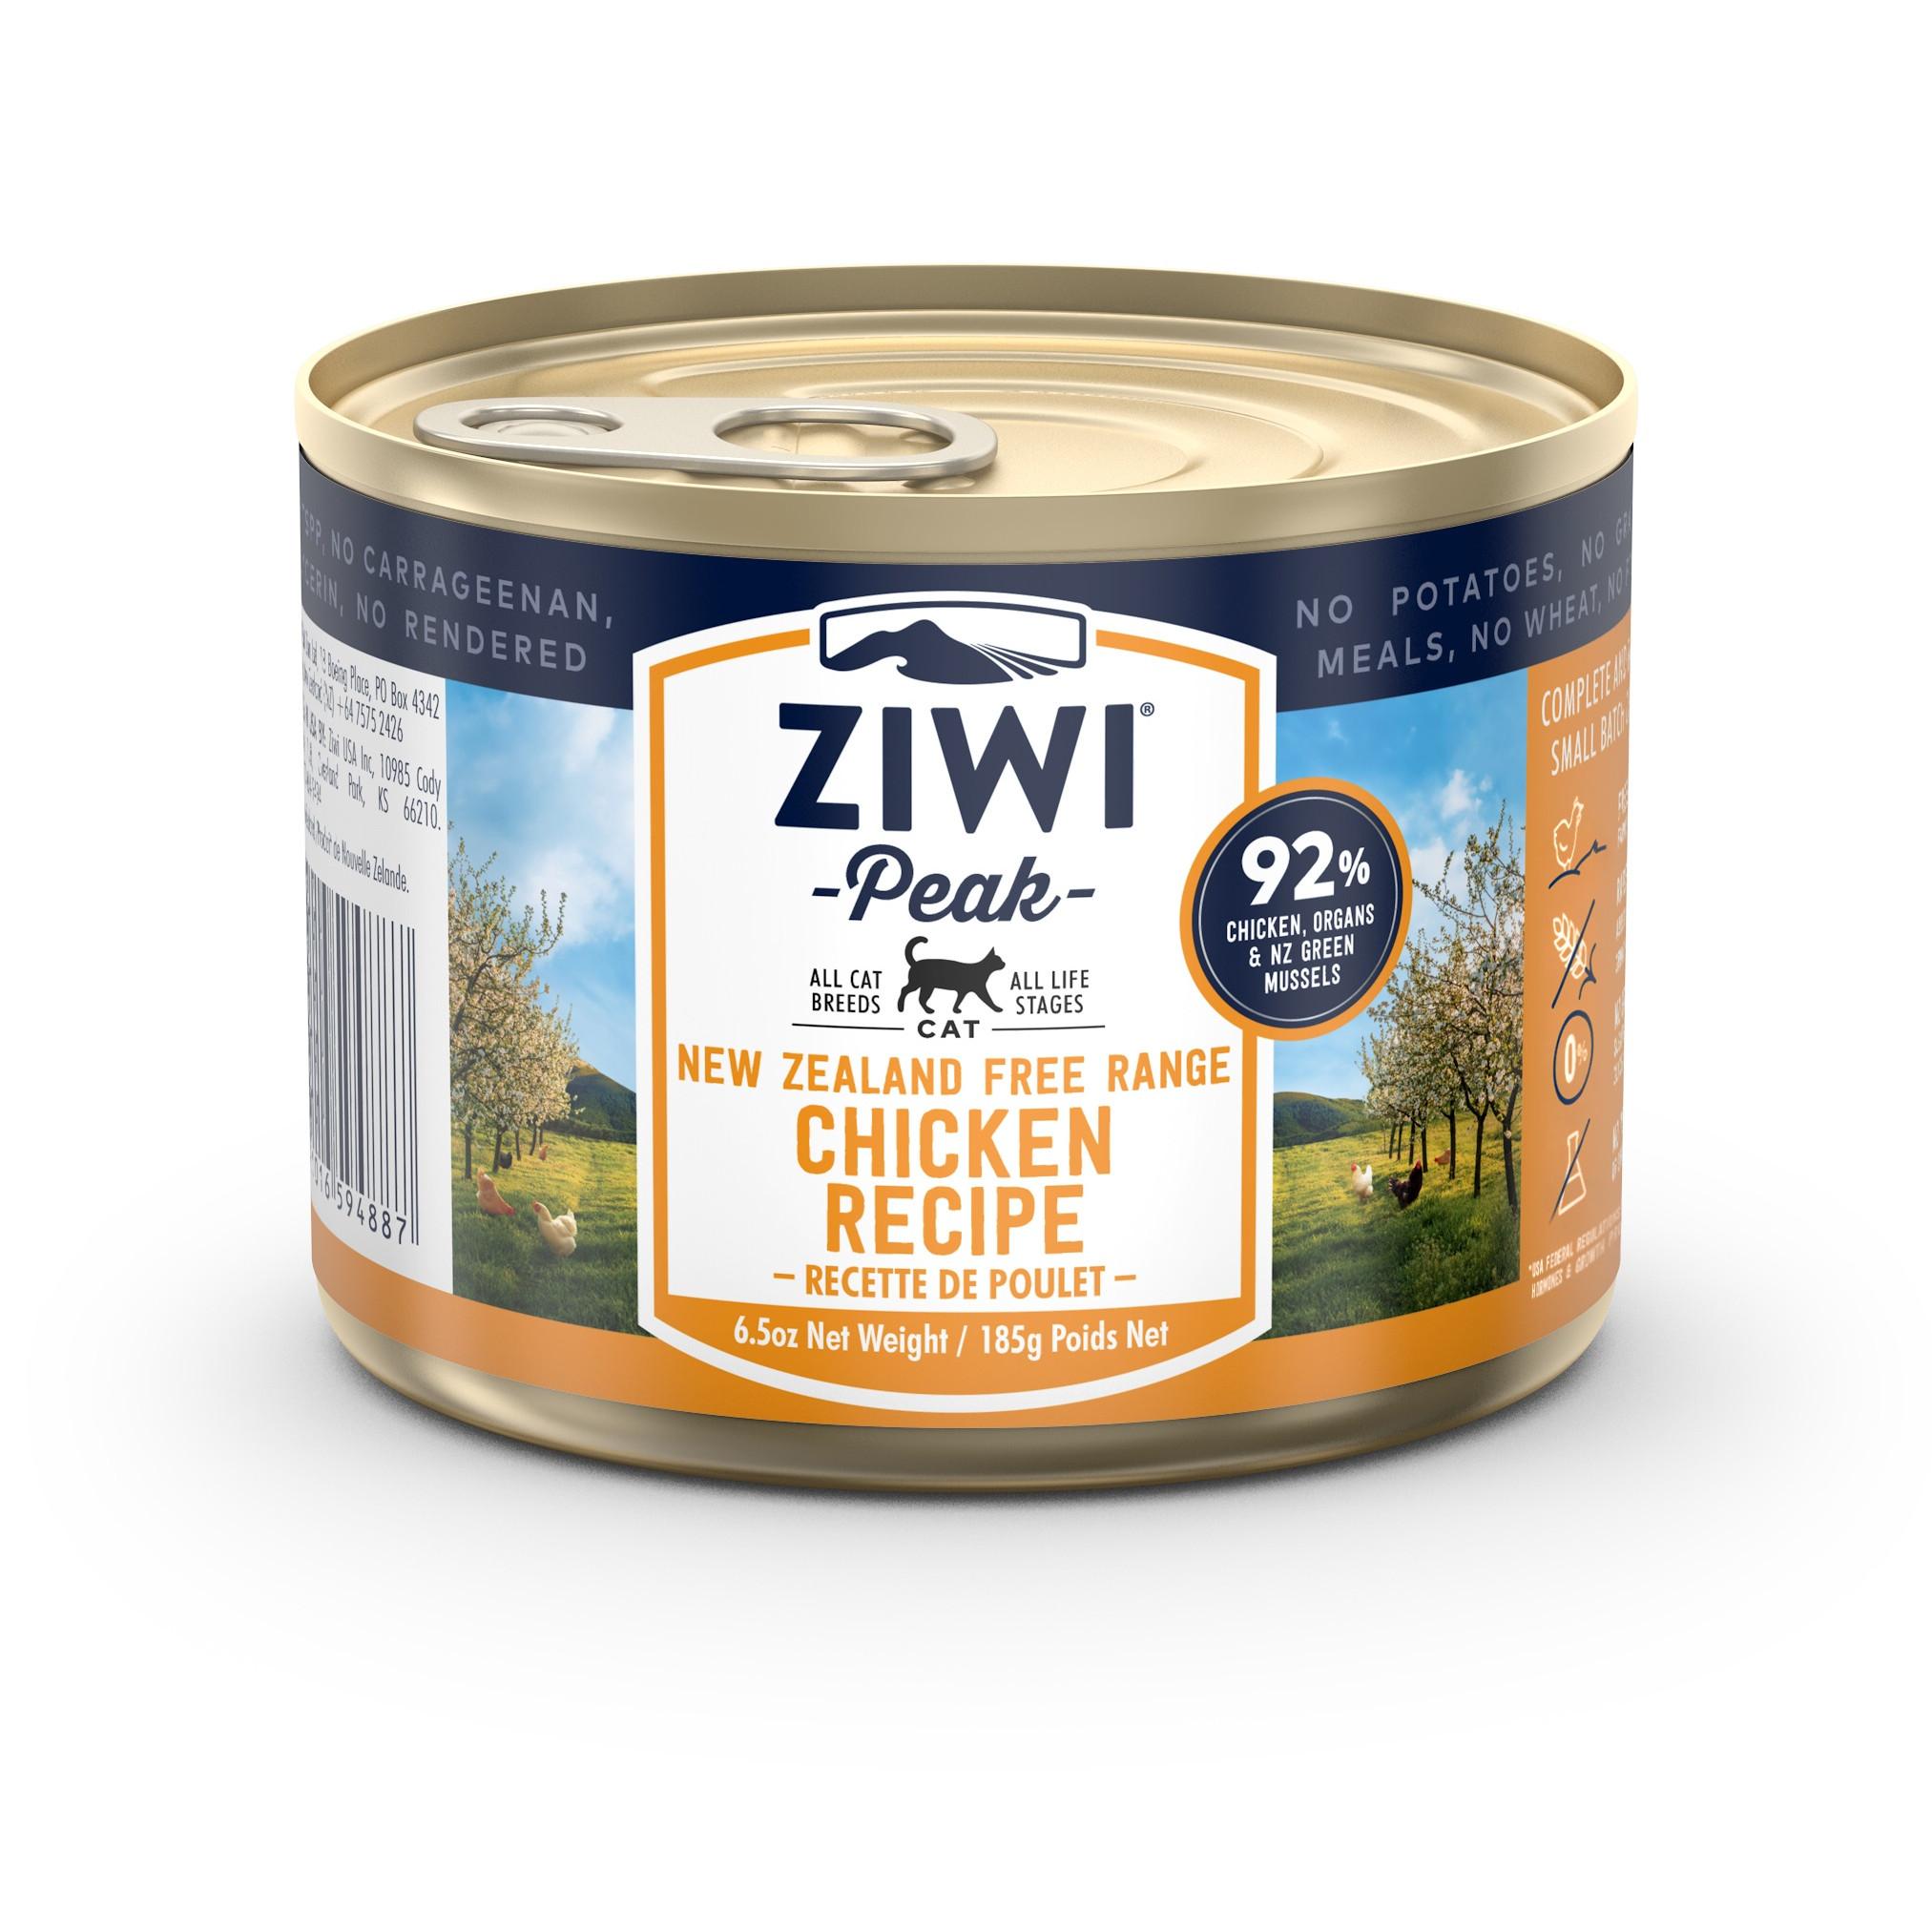 ZIWI Peak Canned Cat Food Chicken Recipe, 6.5-oz|185-g